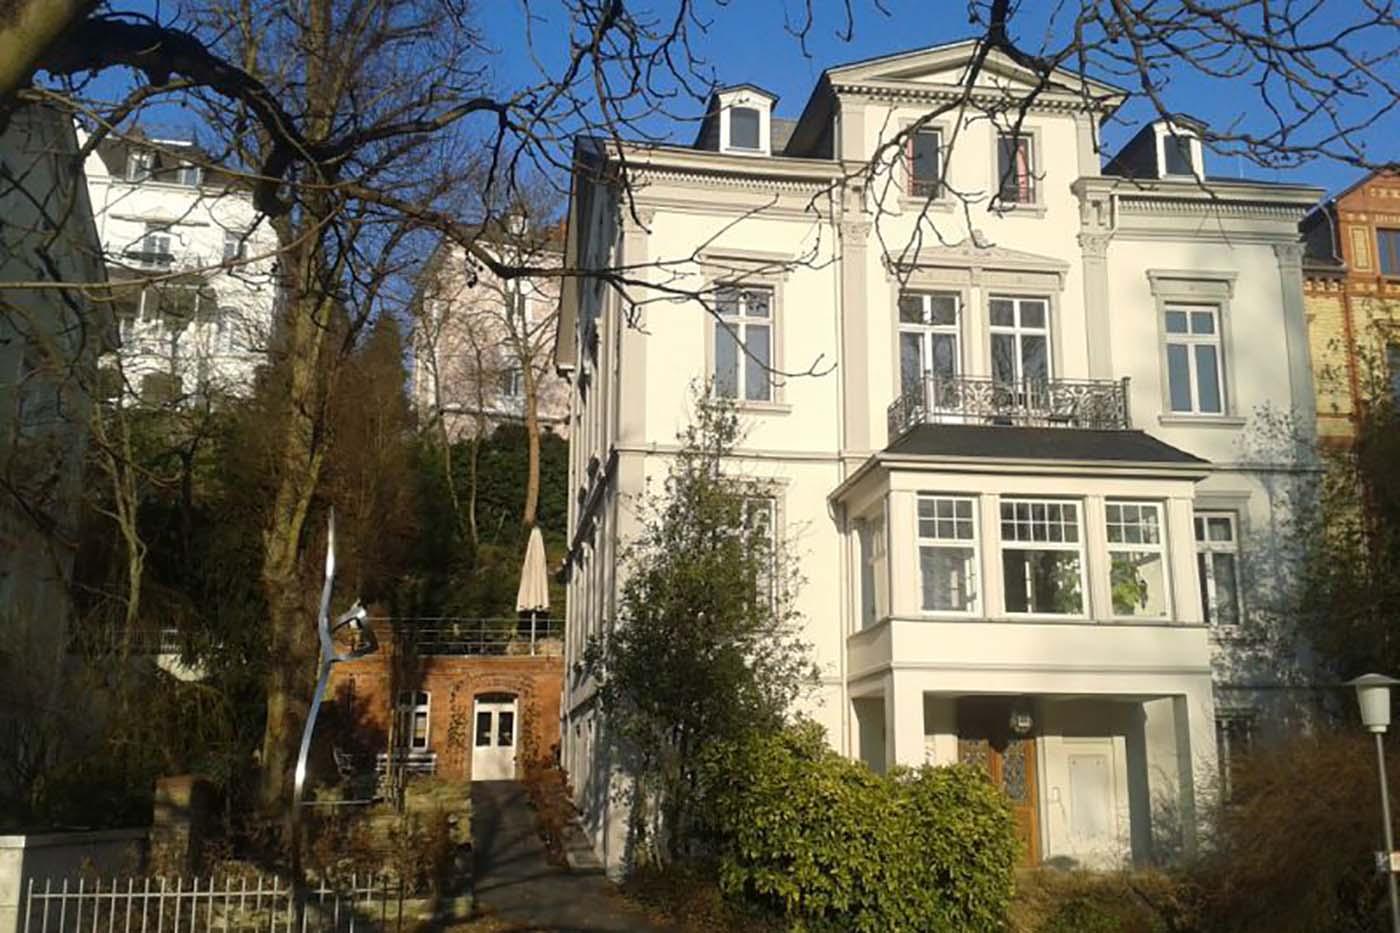 001j. Villa Marienquelle (fertig)